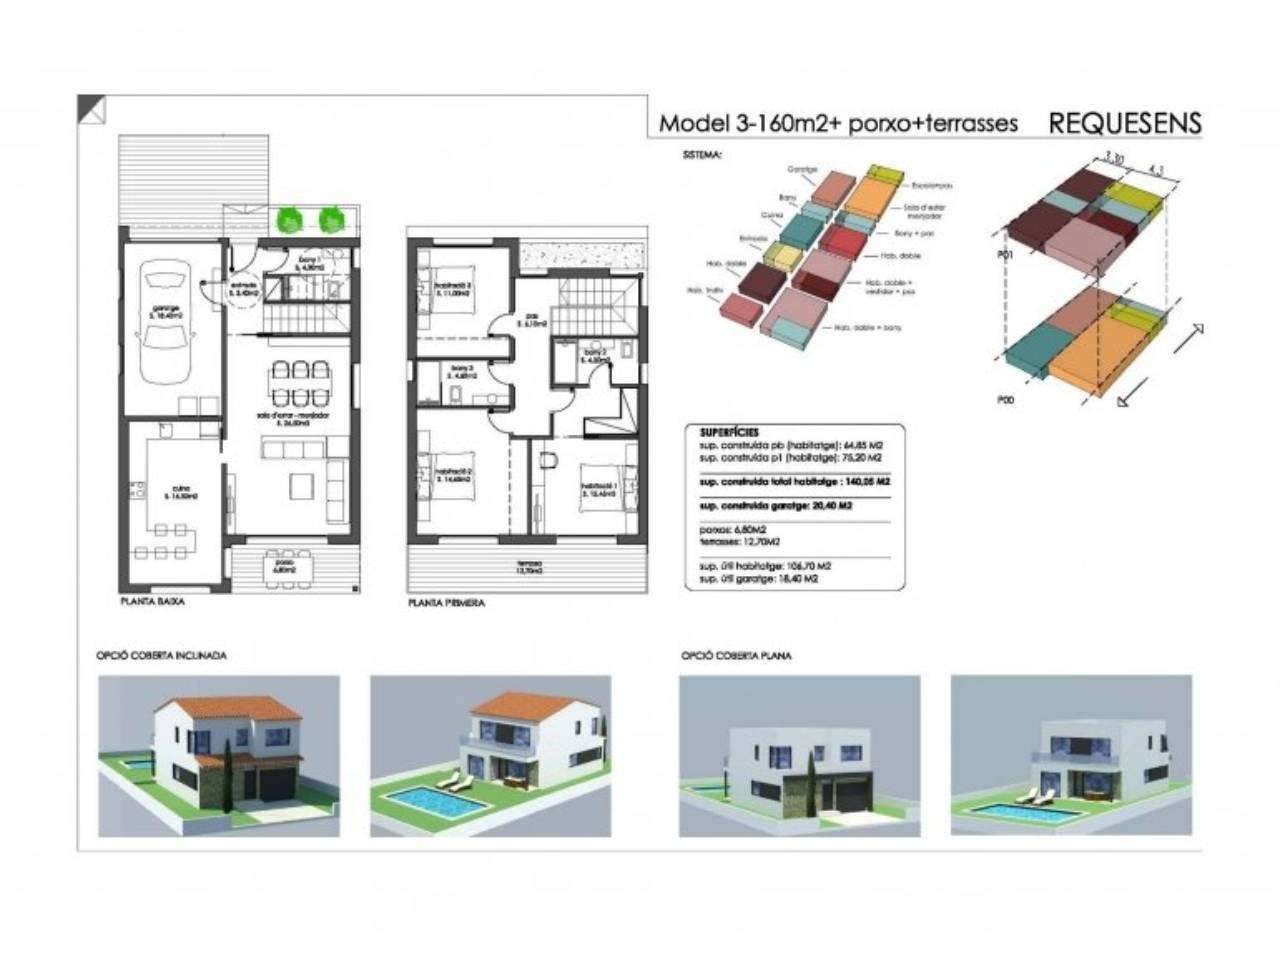 006047 - GARRIGUELLA Building Plot